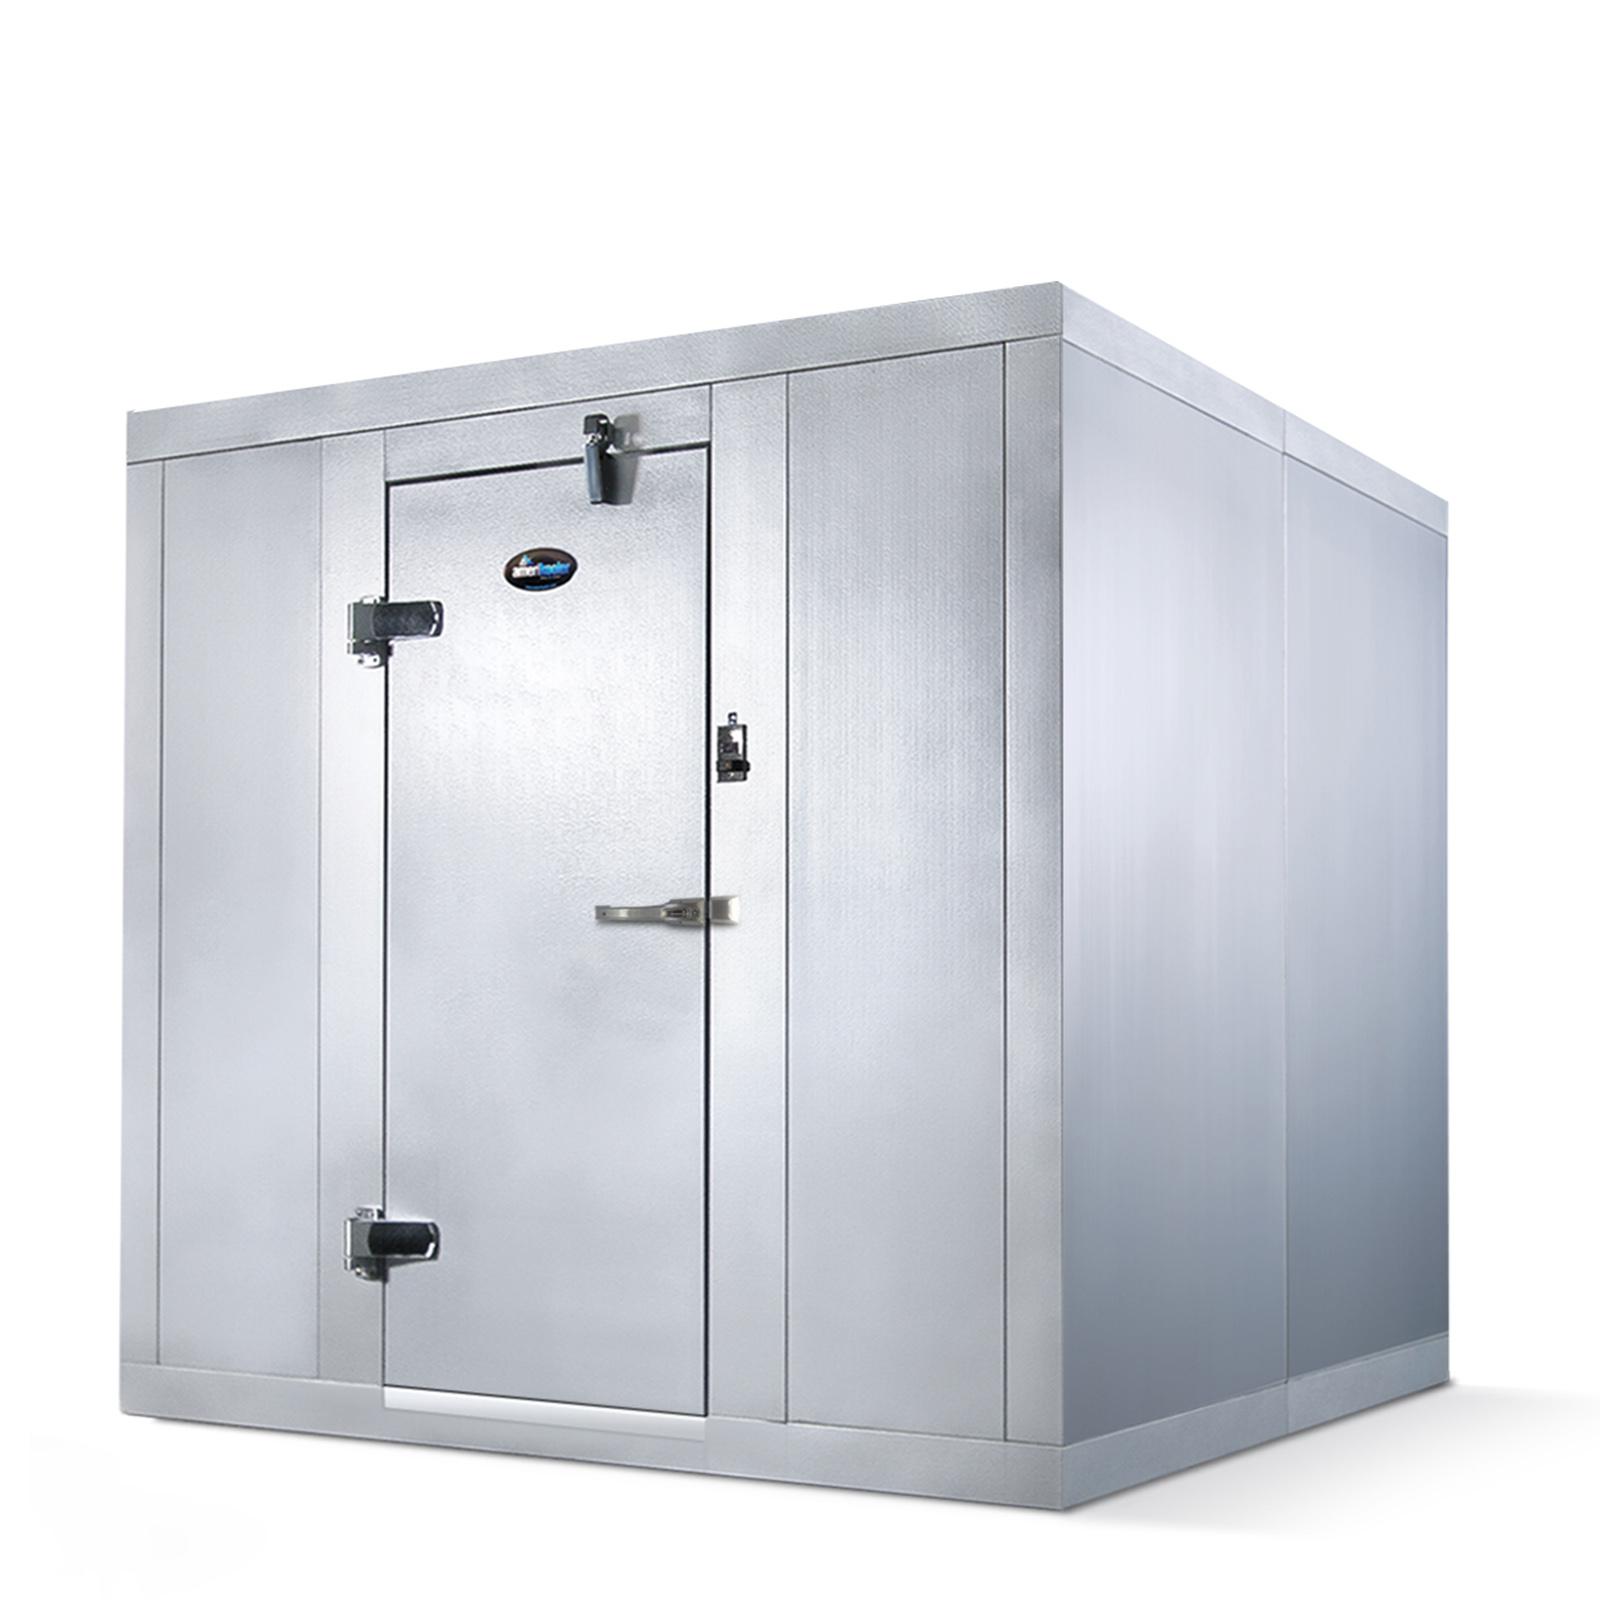 AmeriKooler DC090972**NBRC walk in cooler, modular, remote